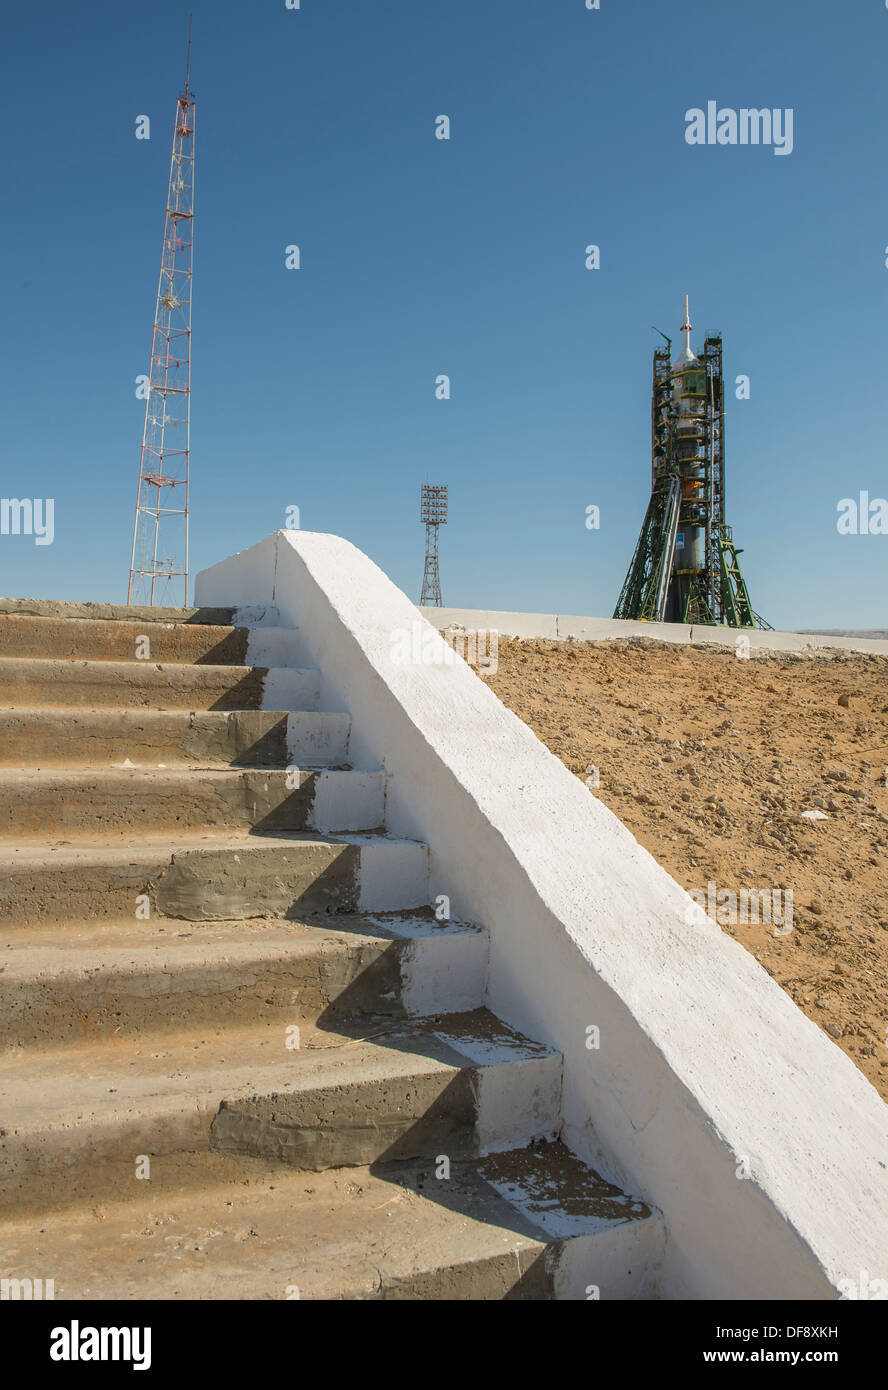 Expedition 37 Soyuz Rocket - Stock Image